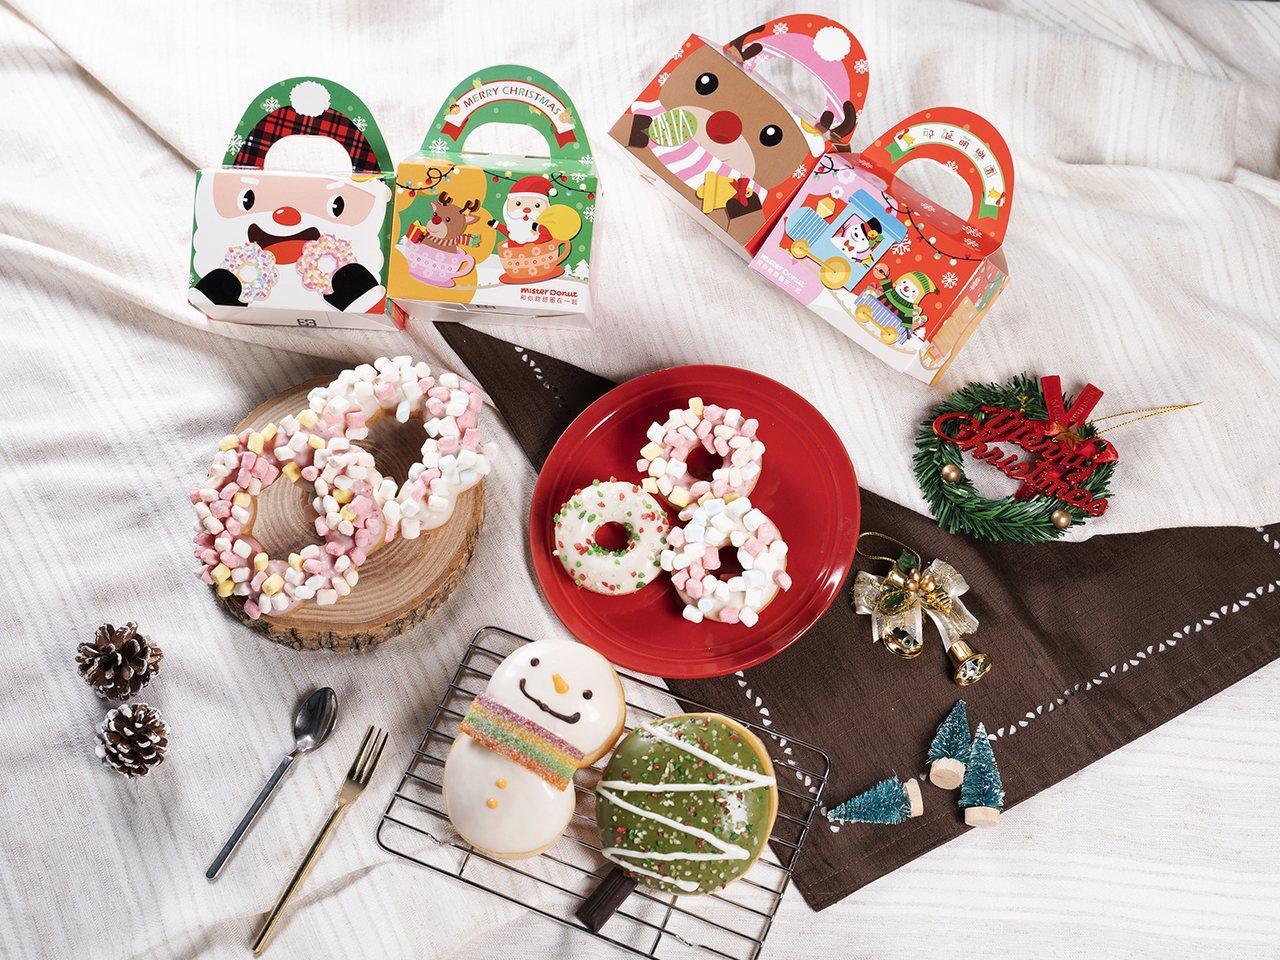 Mister Donut耶誕系列甜甜圈,耶誕雪人與耶誕樹仔,售價50元。圖/Mi...